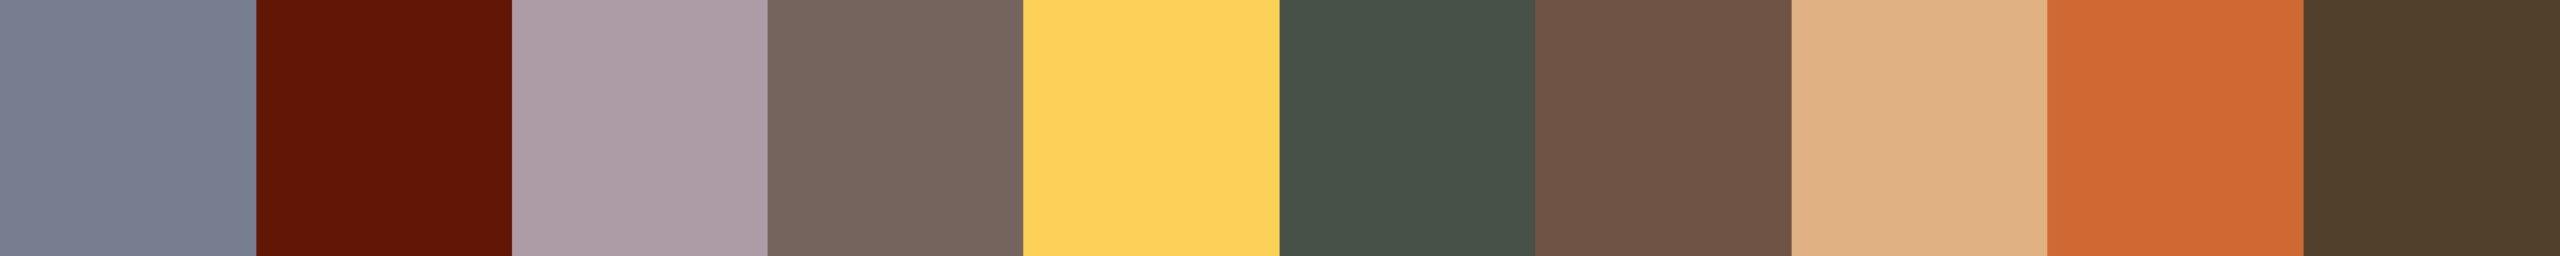 160 Ygepoo Color Palette